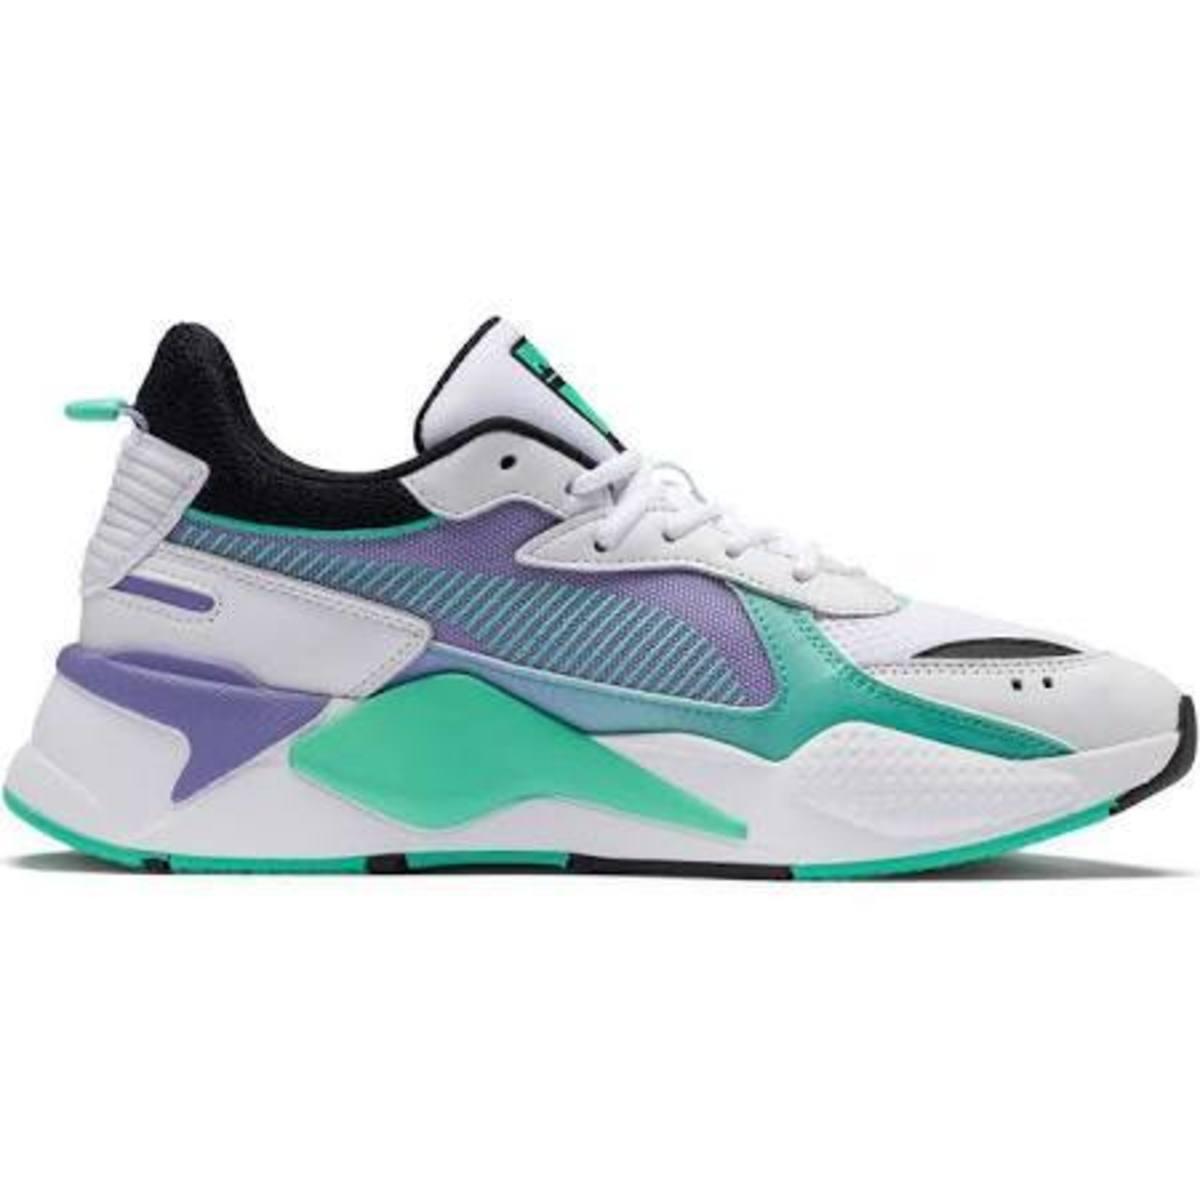 Puma MTV x RS-X Tracks 80's Sneakers